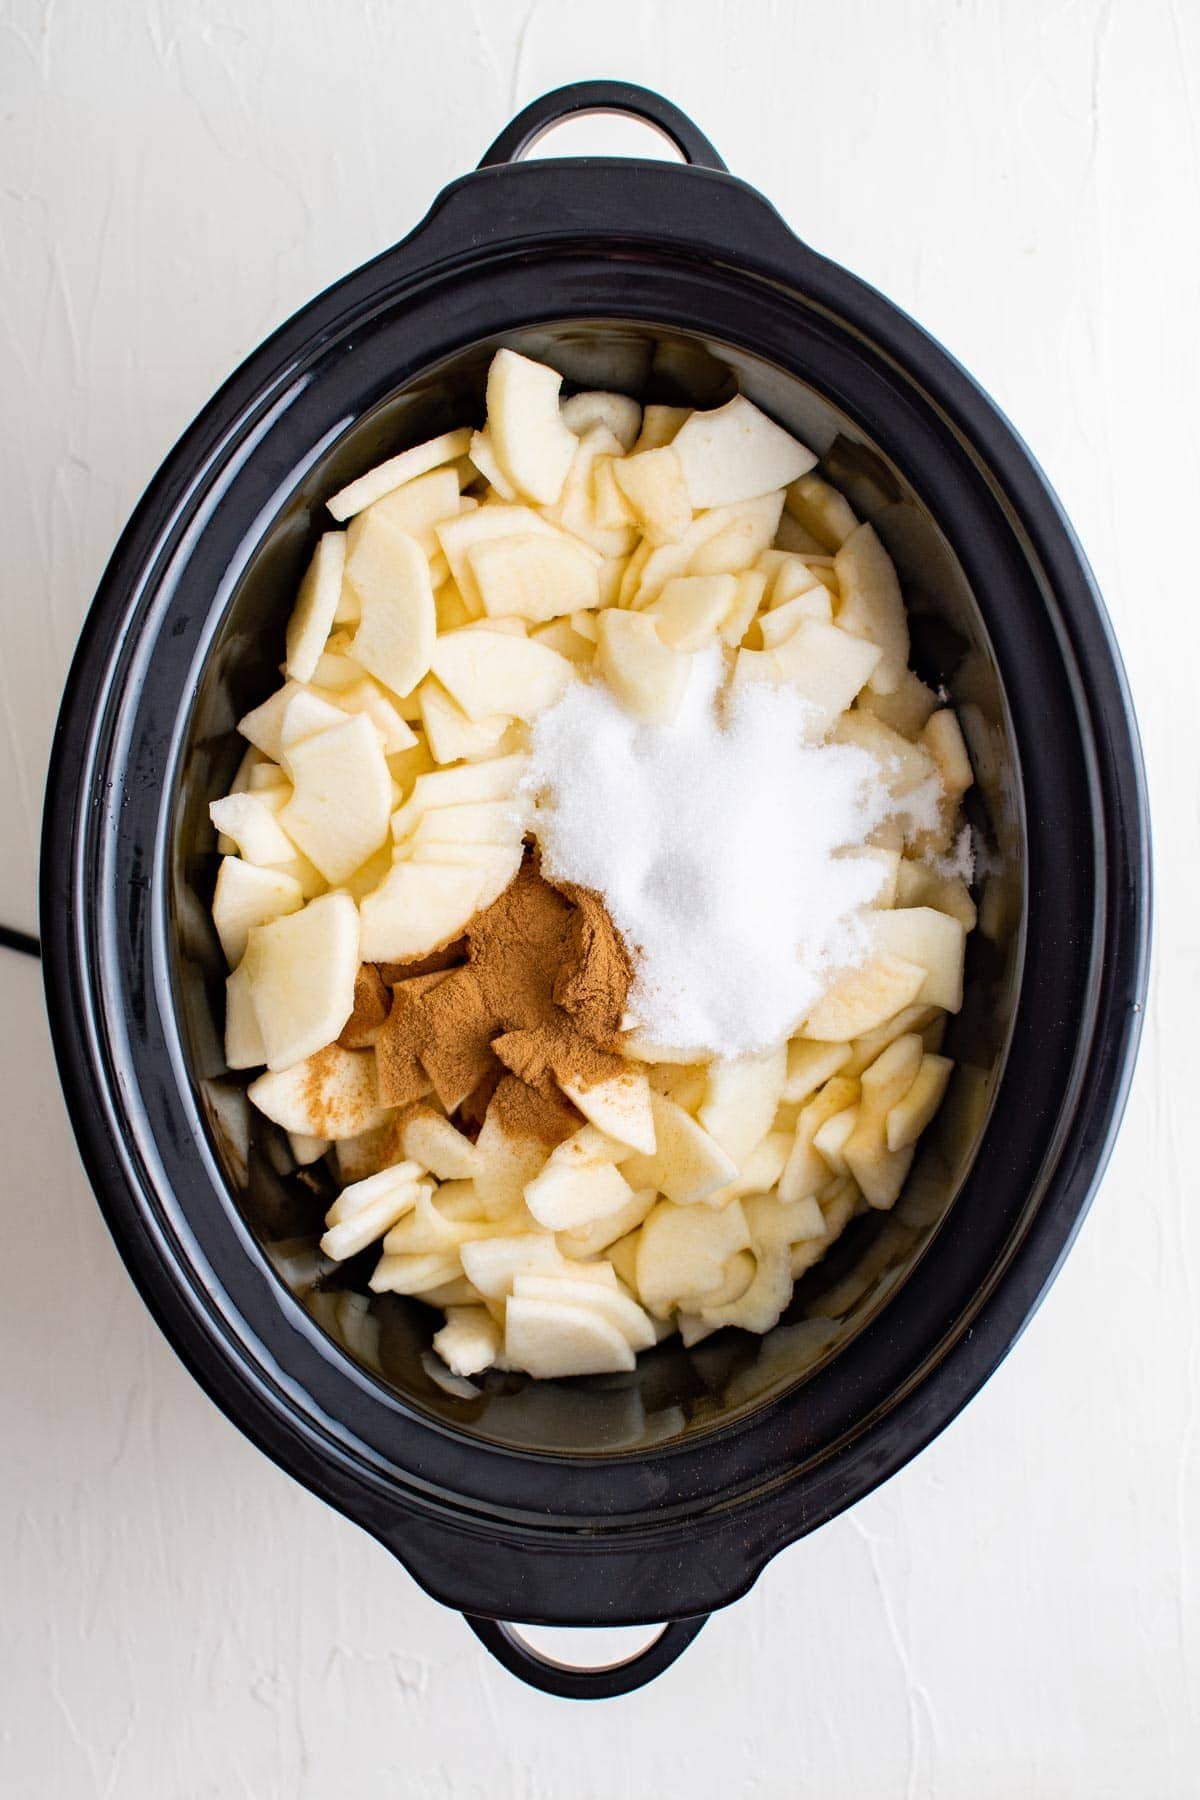 apples, cinnamon and sugar in a crock pot